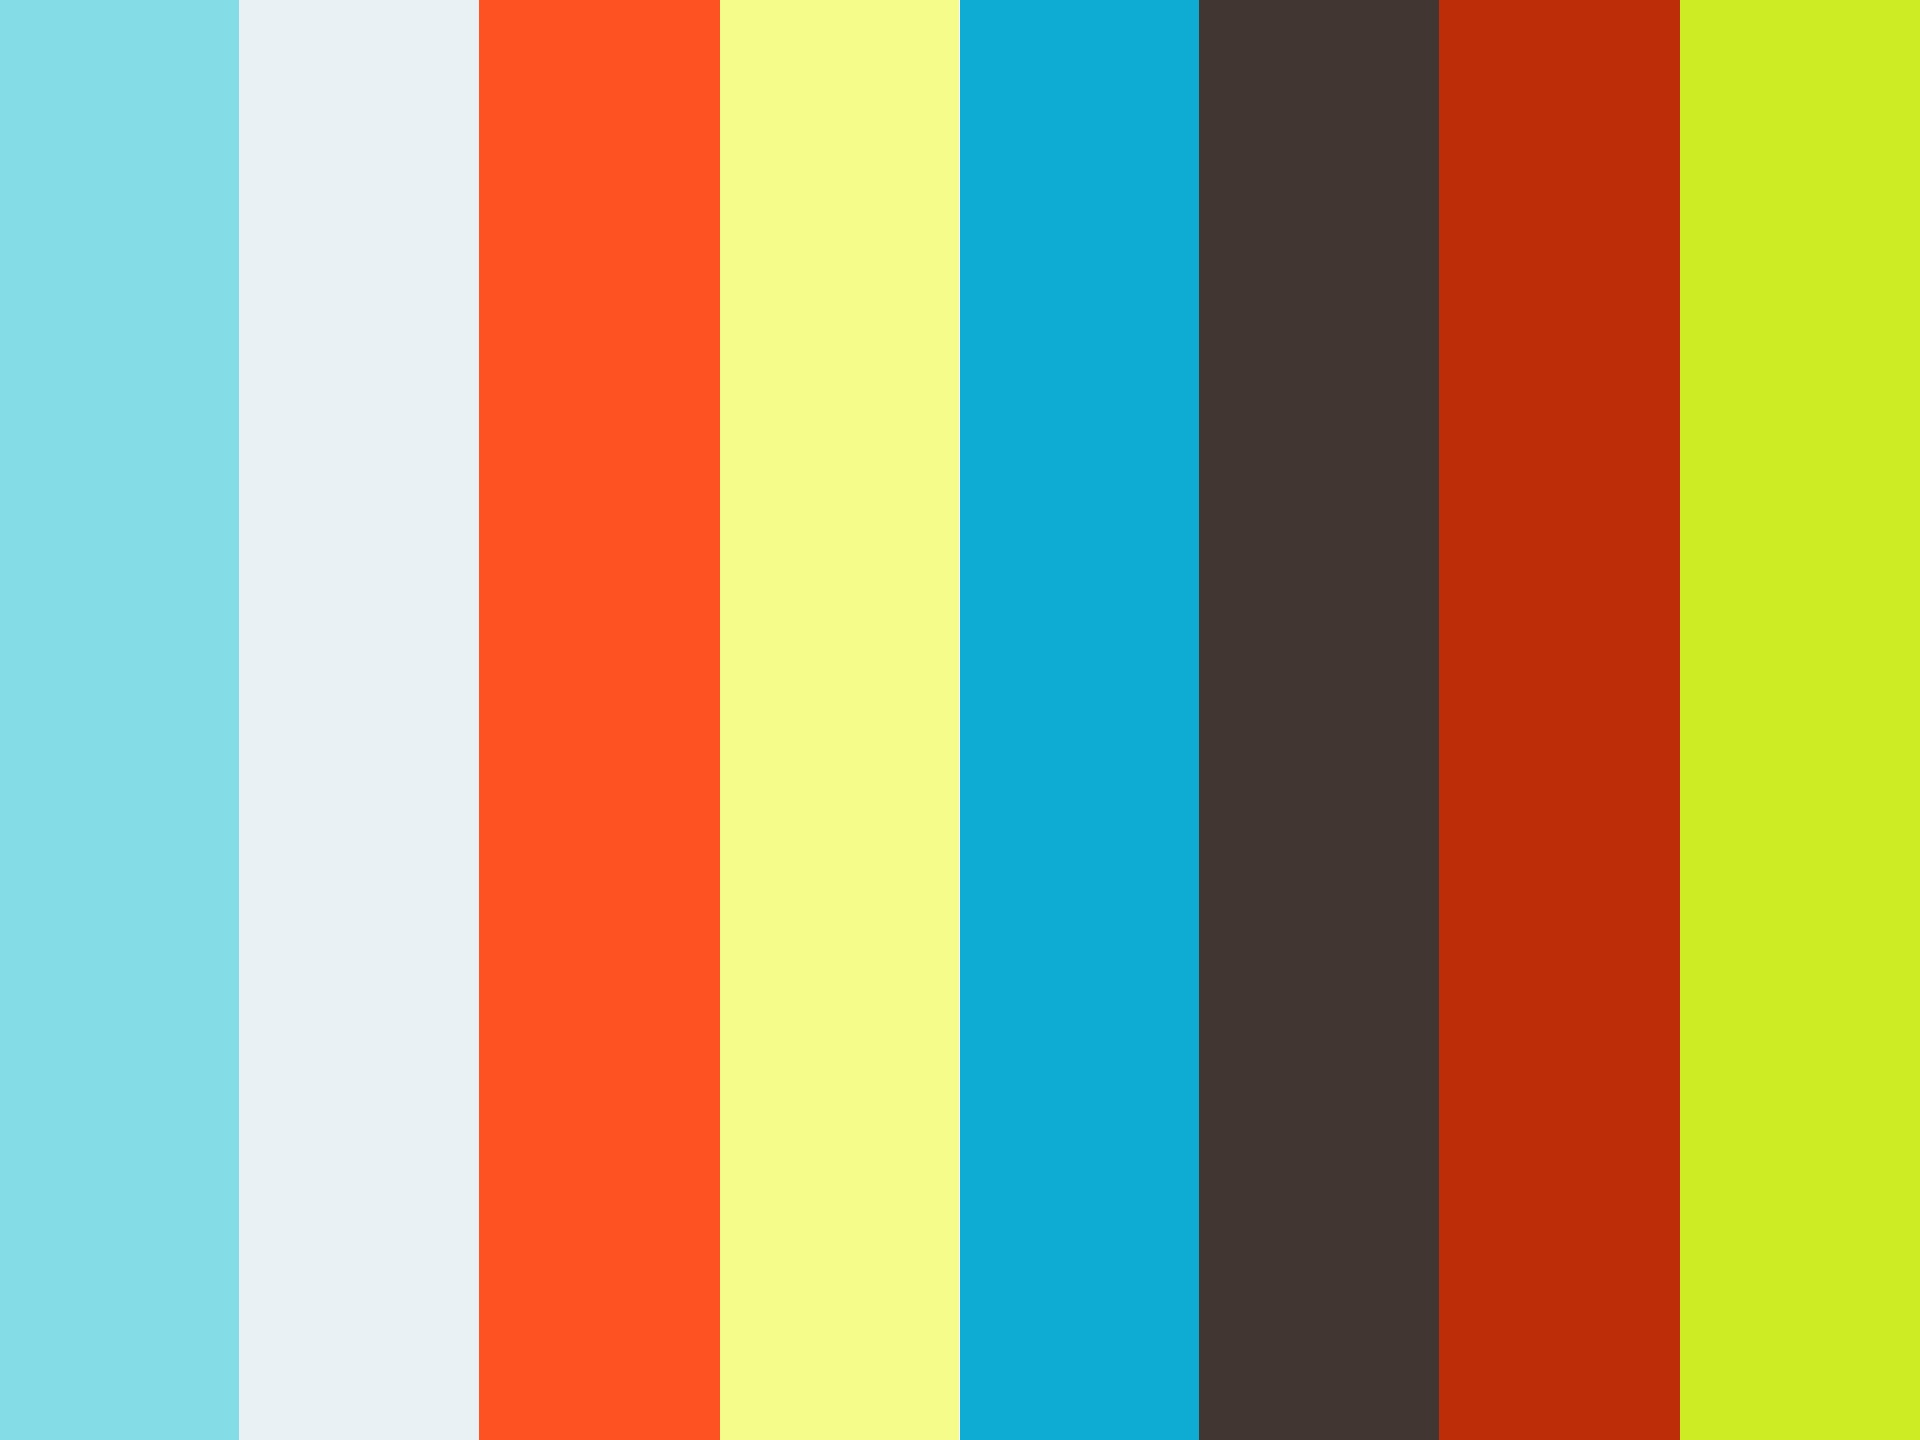 Cinema 4D Python Script: Sequence tracks